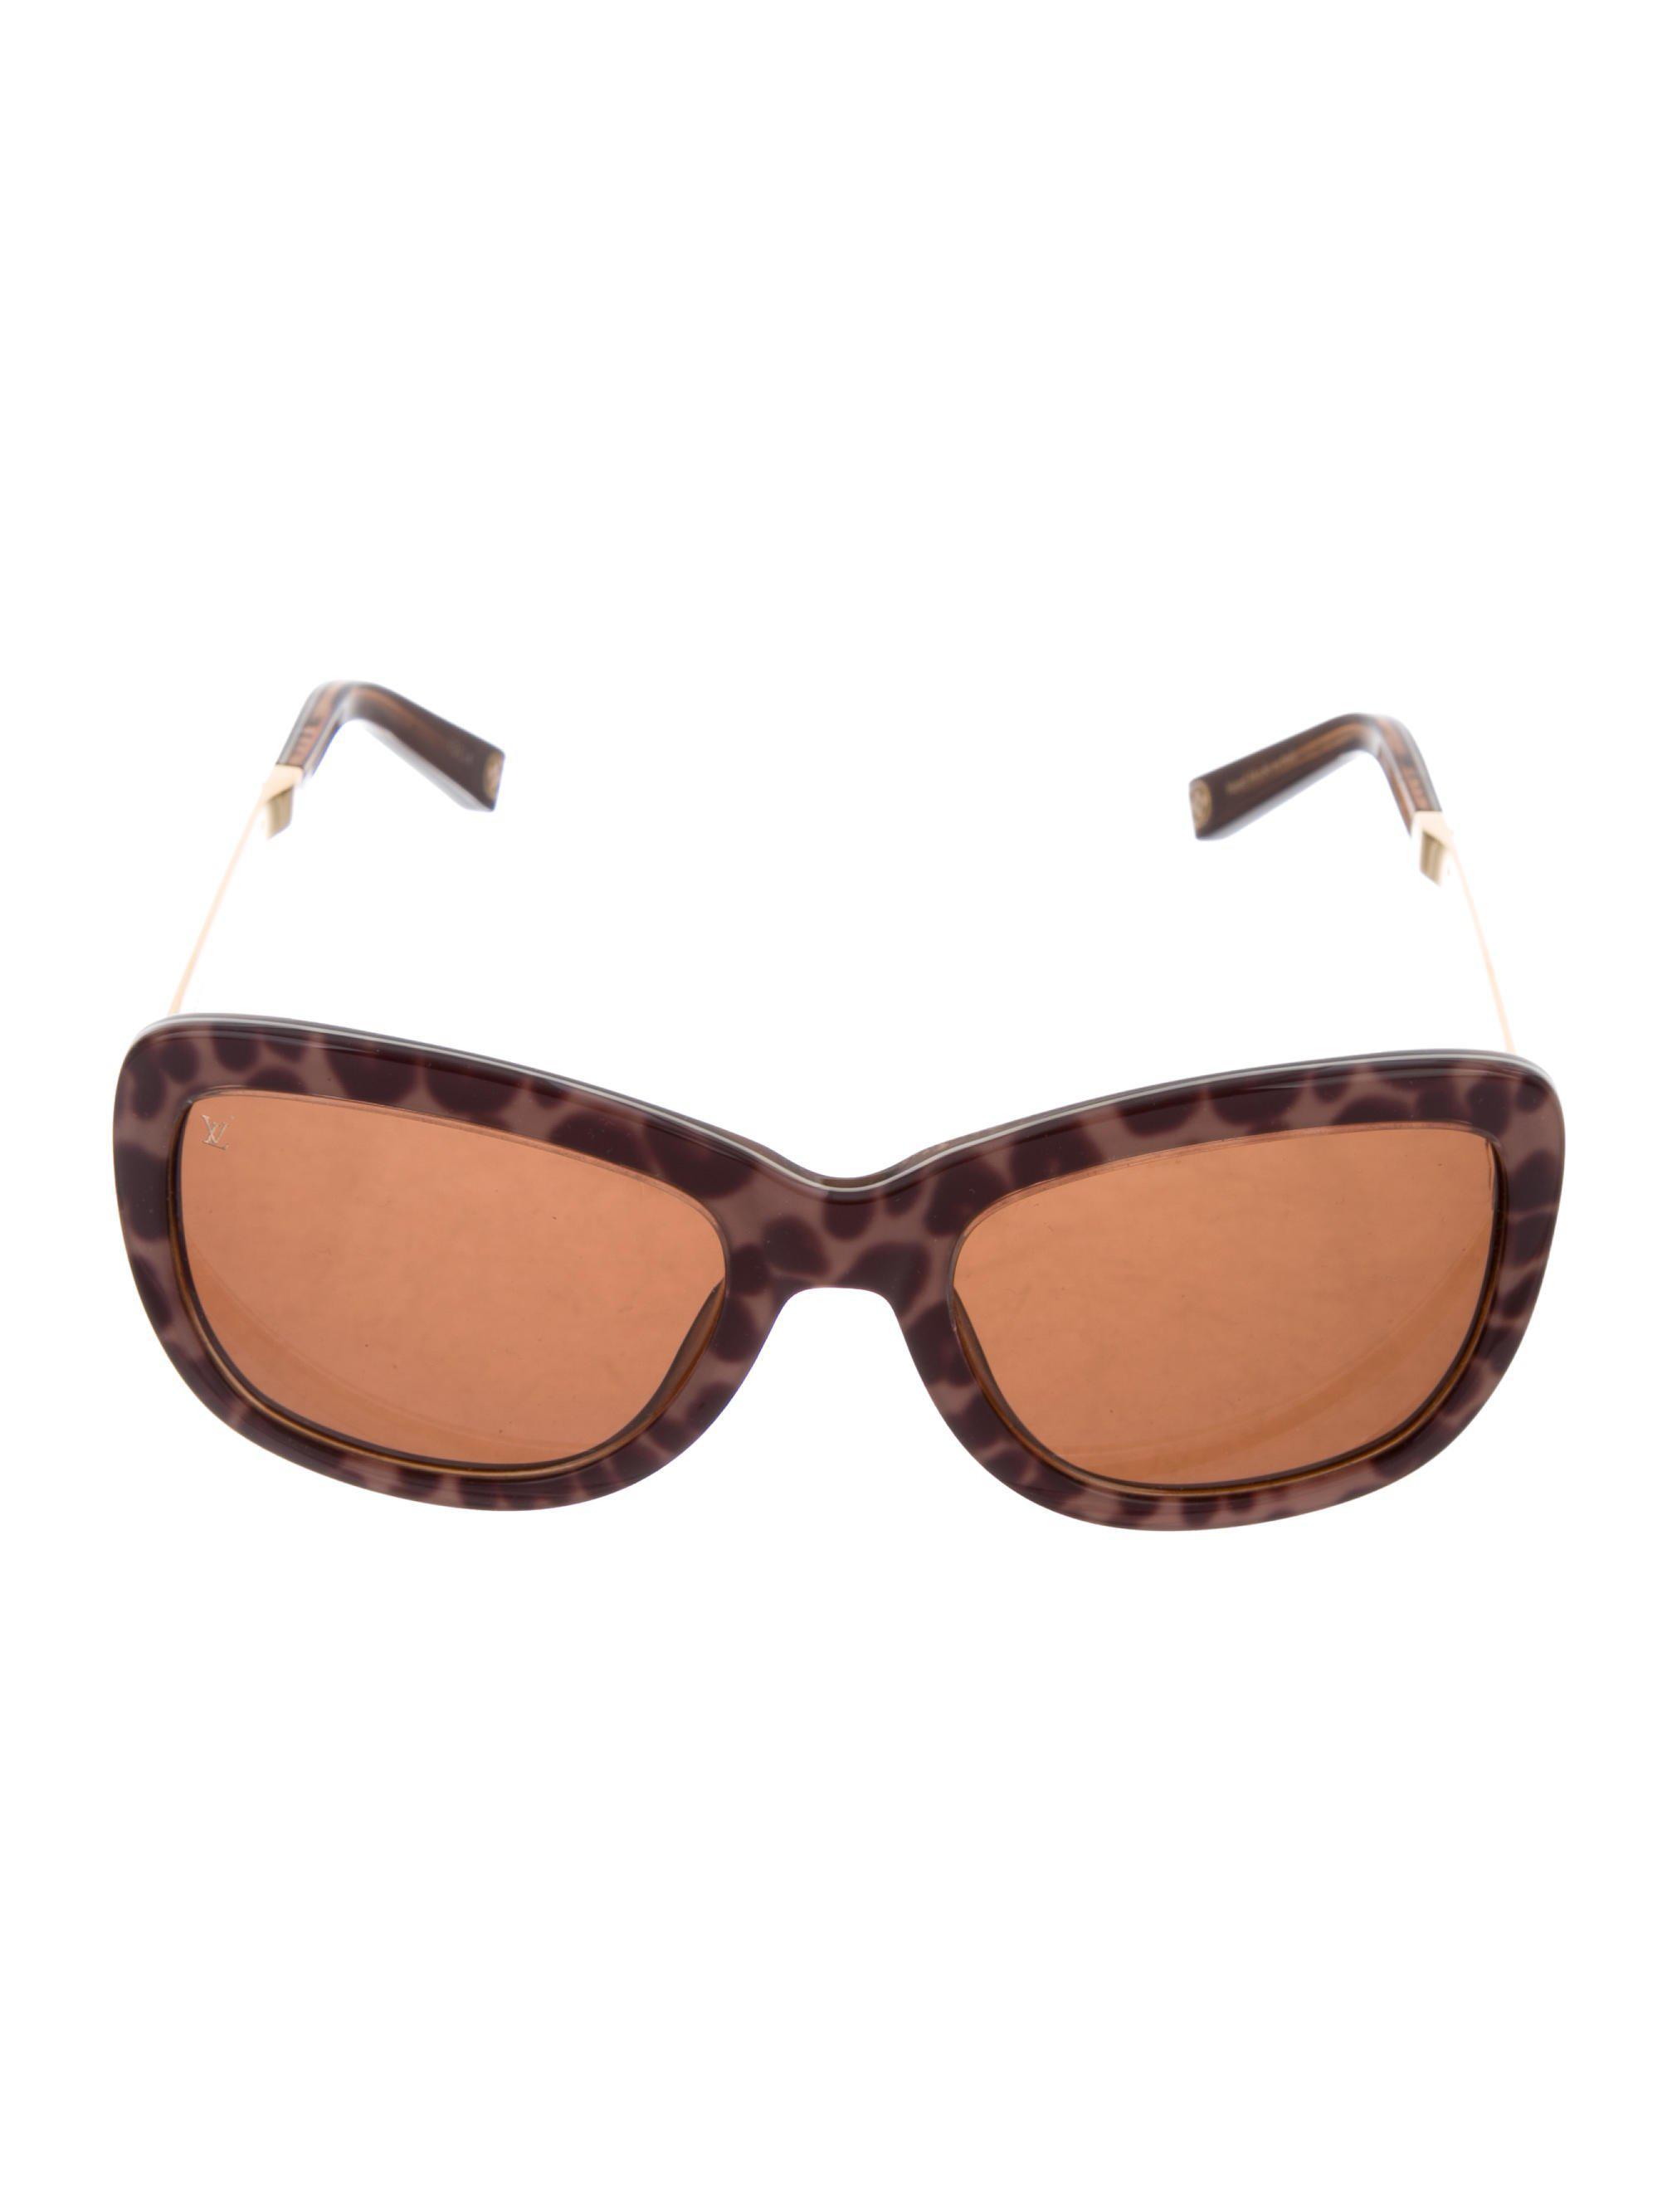 2c1e986f3a94 Lyst - Louis Vuitton Petit Soupcon Carre Sunglasses Brown in Natural